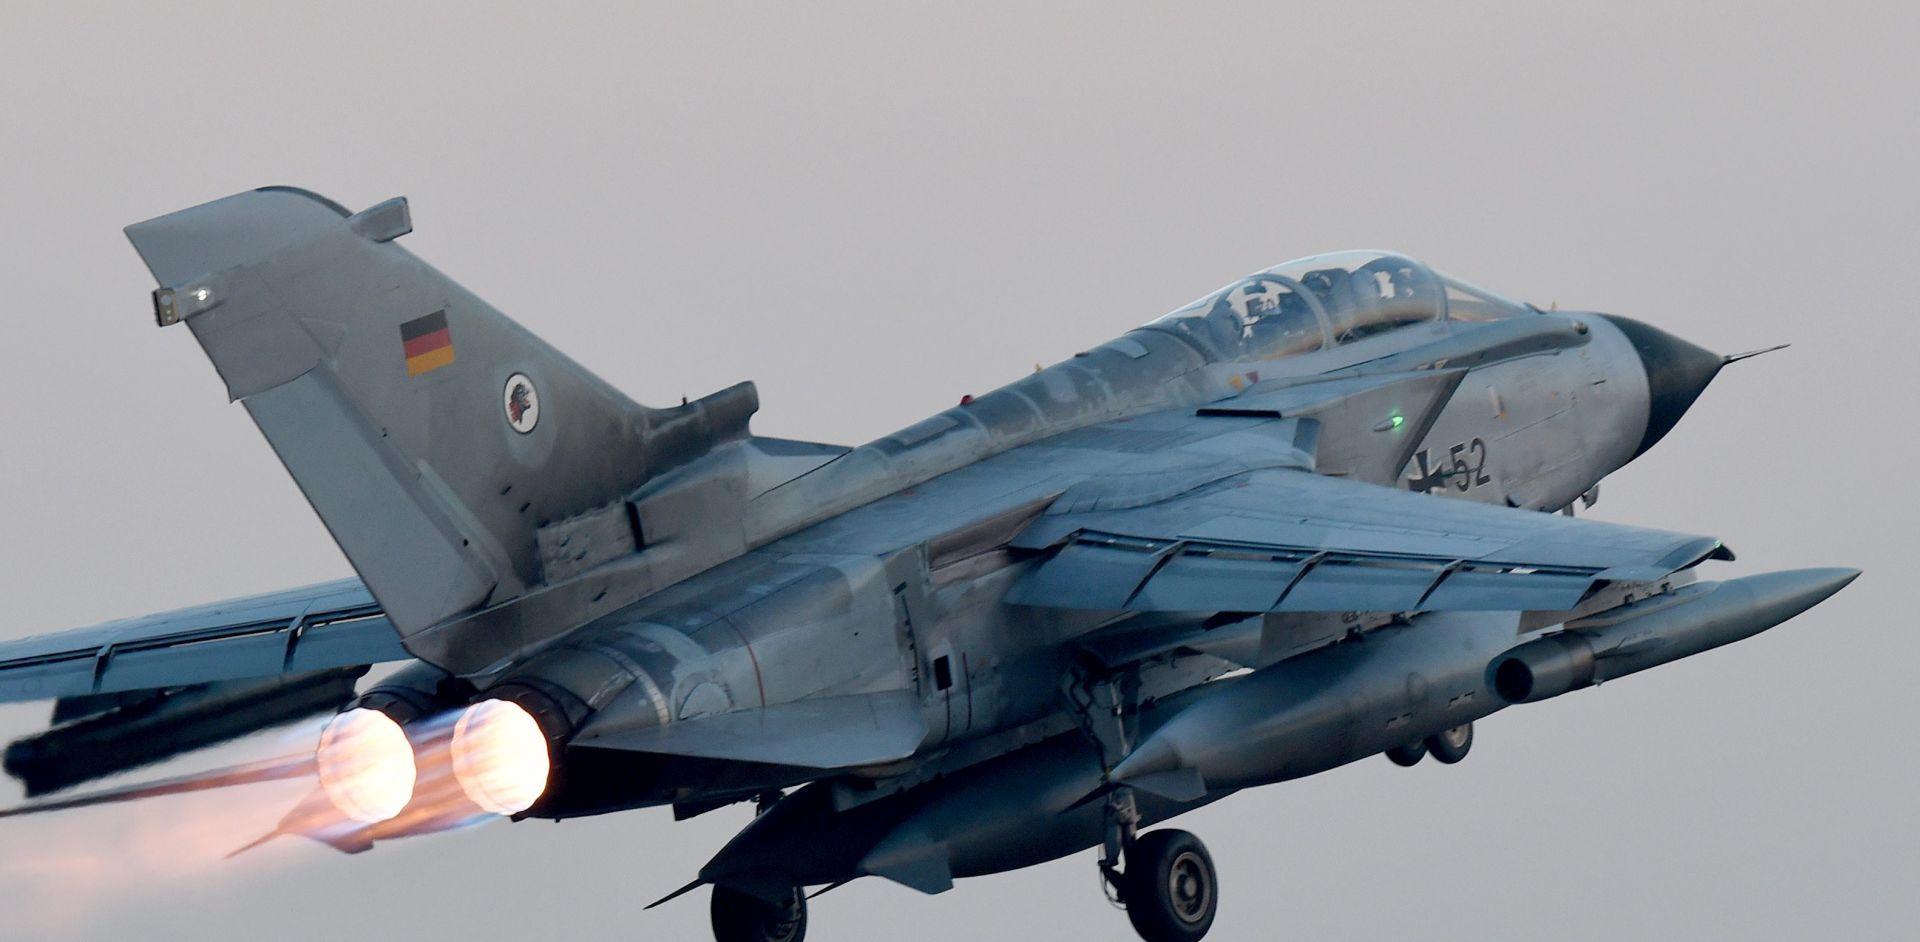 LUFTWAFFE: Ruski lovci prate njemačke zrakoplove nad Sirijom